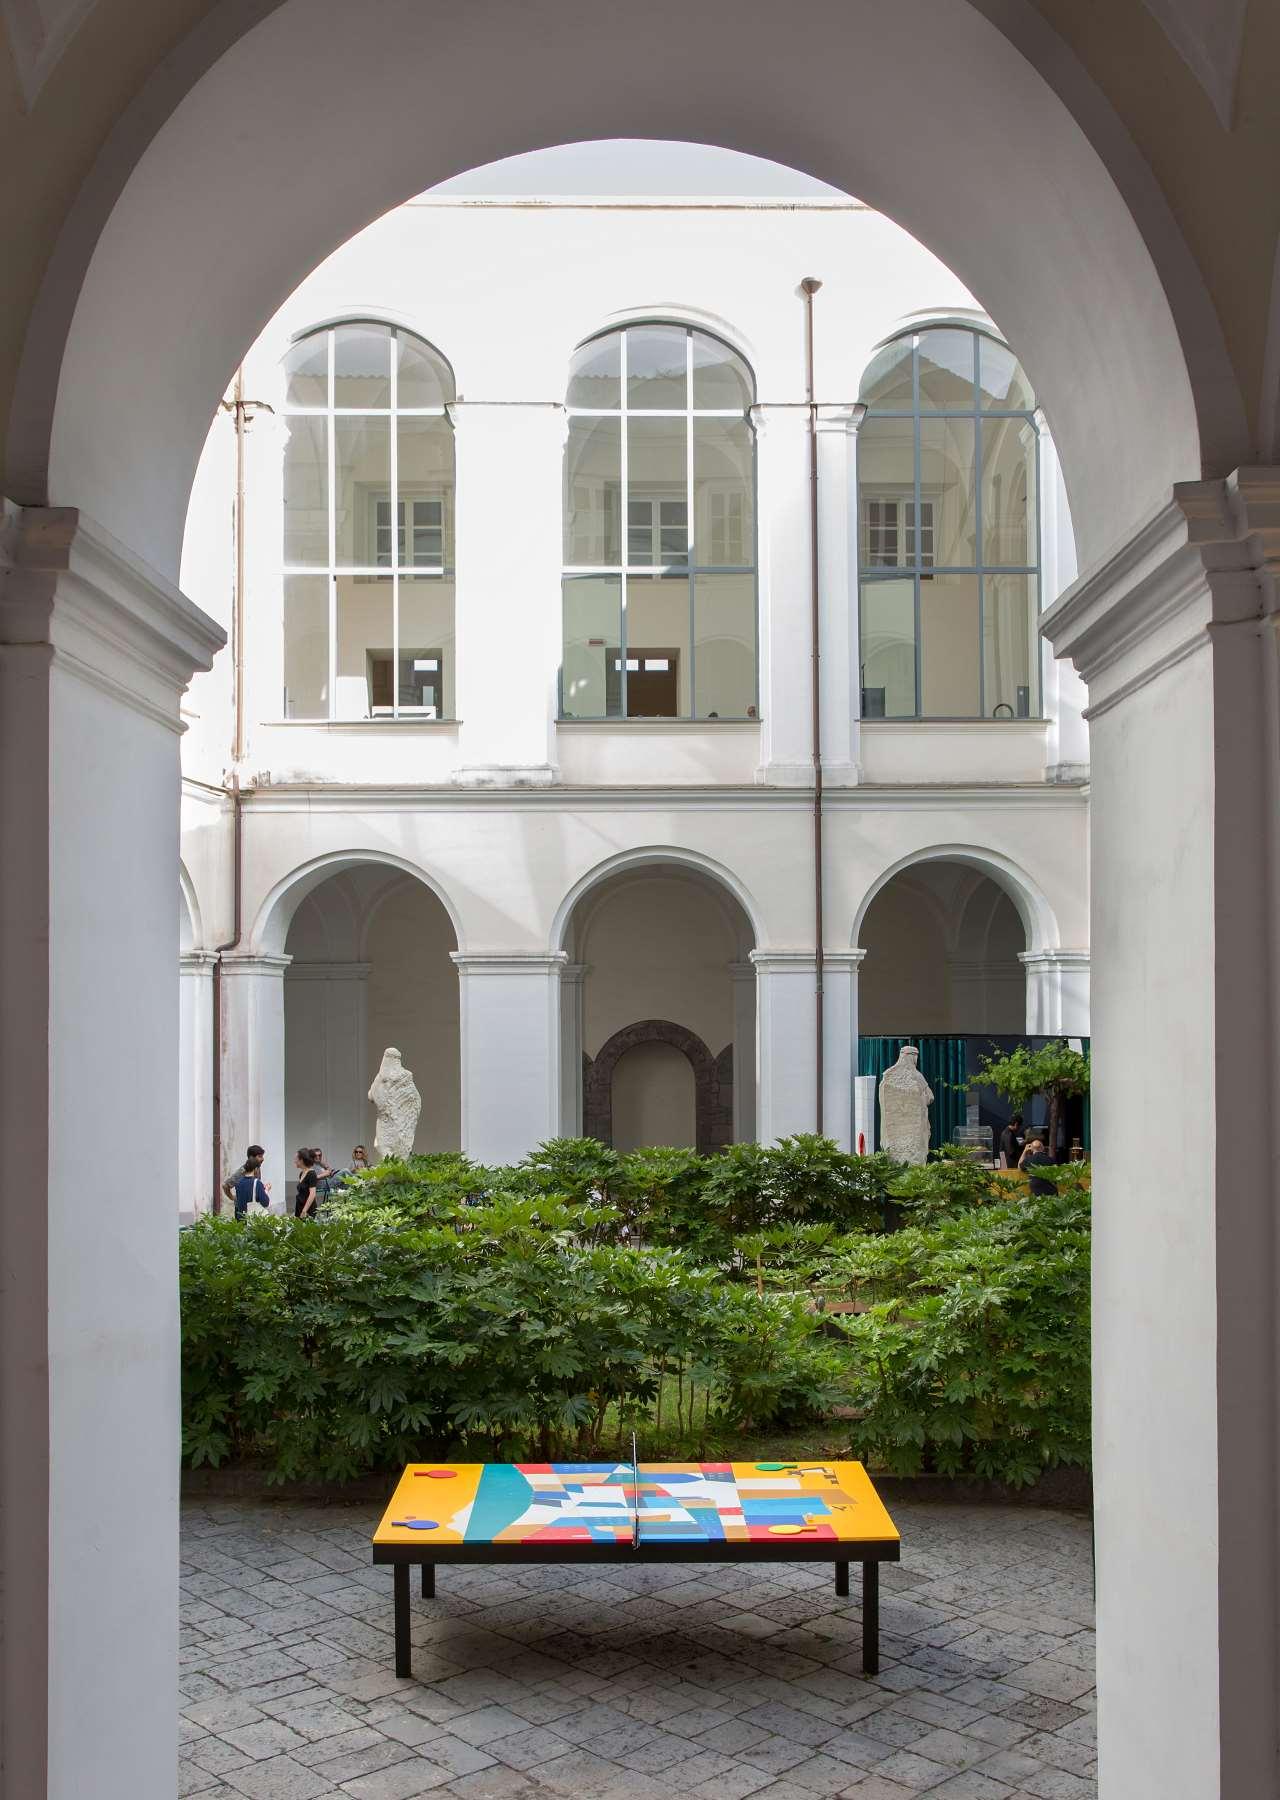 EDIT Napoli exhibition view,PPPattern + Resli Tale x Made in EDIT. Photo © Roberto Pierucci.